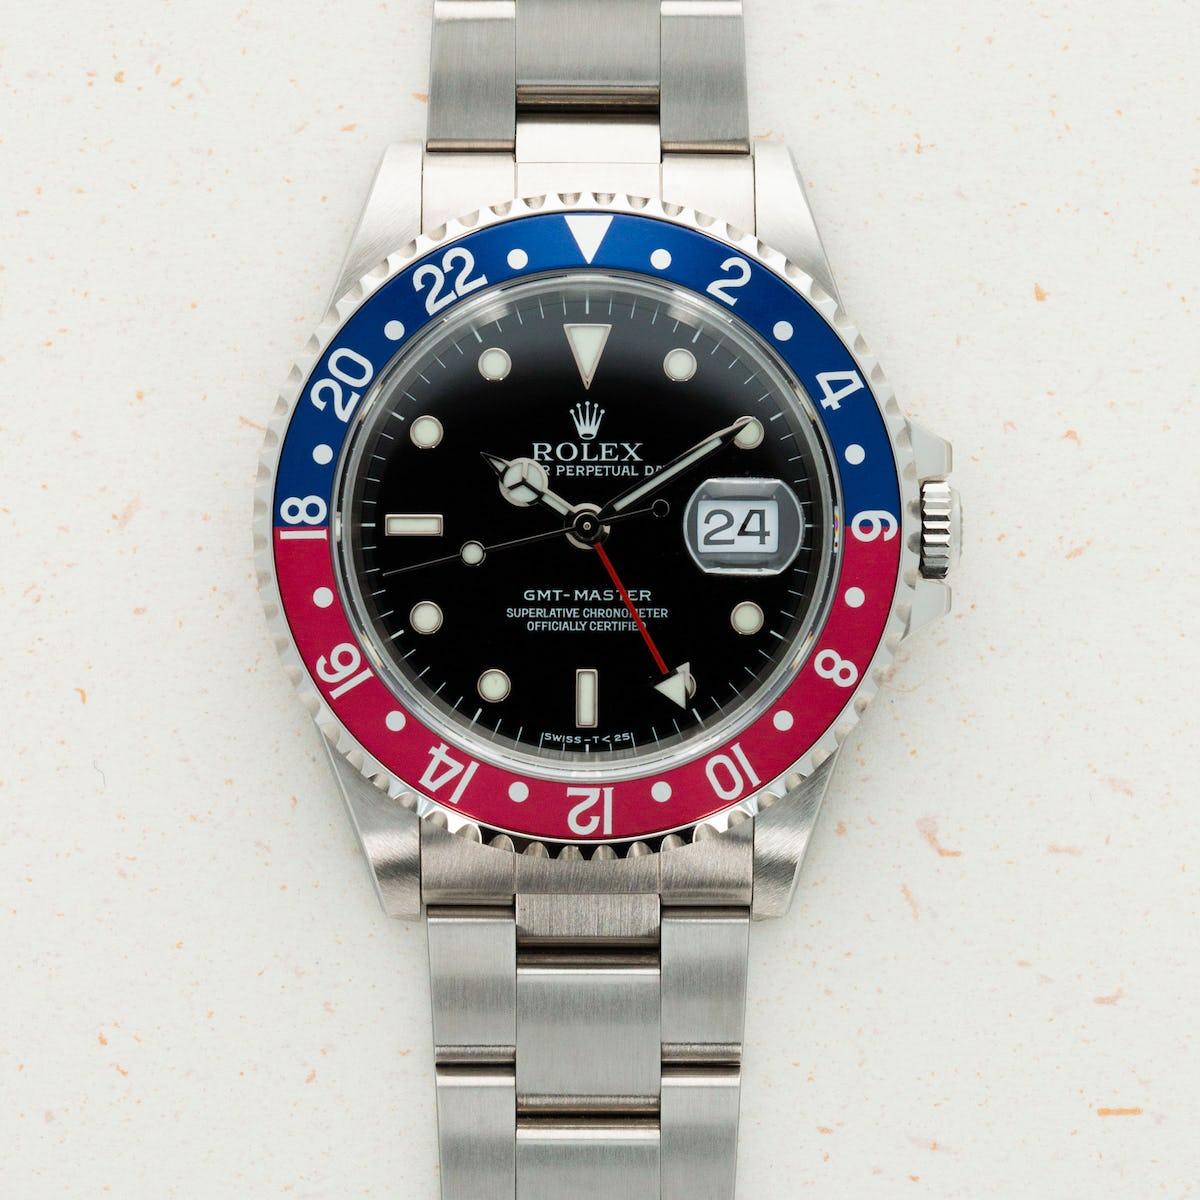 Thumbnail for Rolex GMT-Master Pepsi 16700